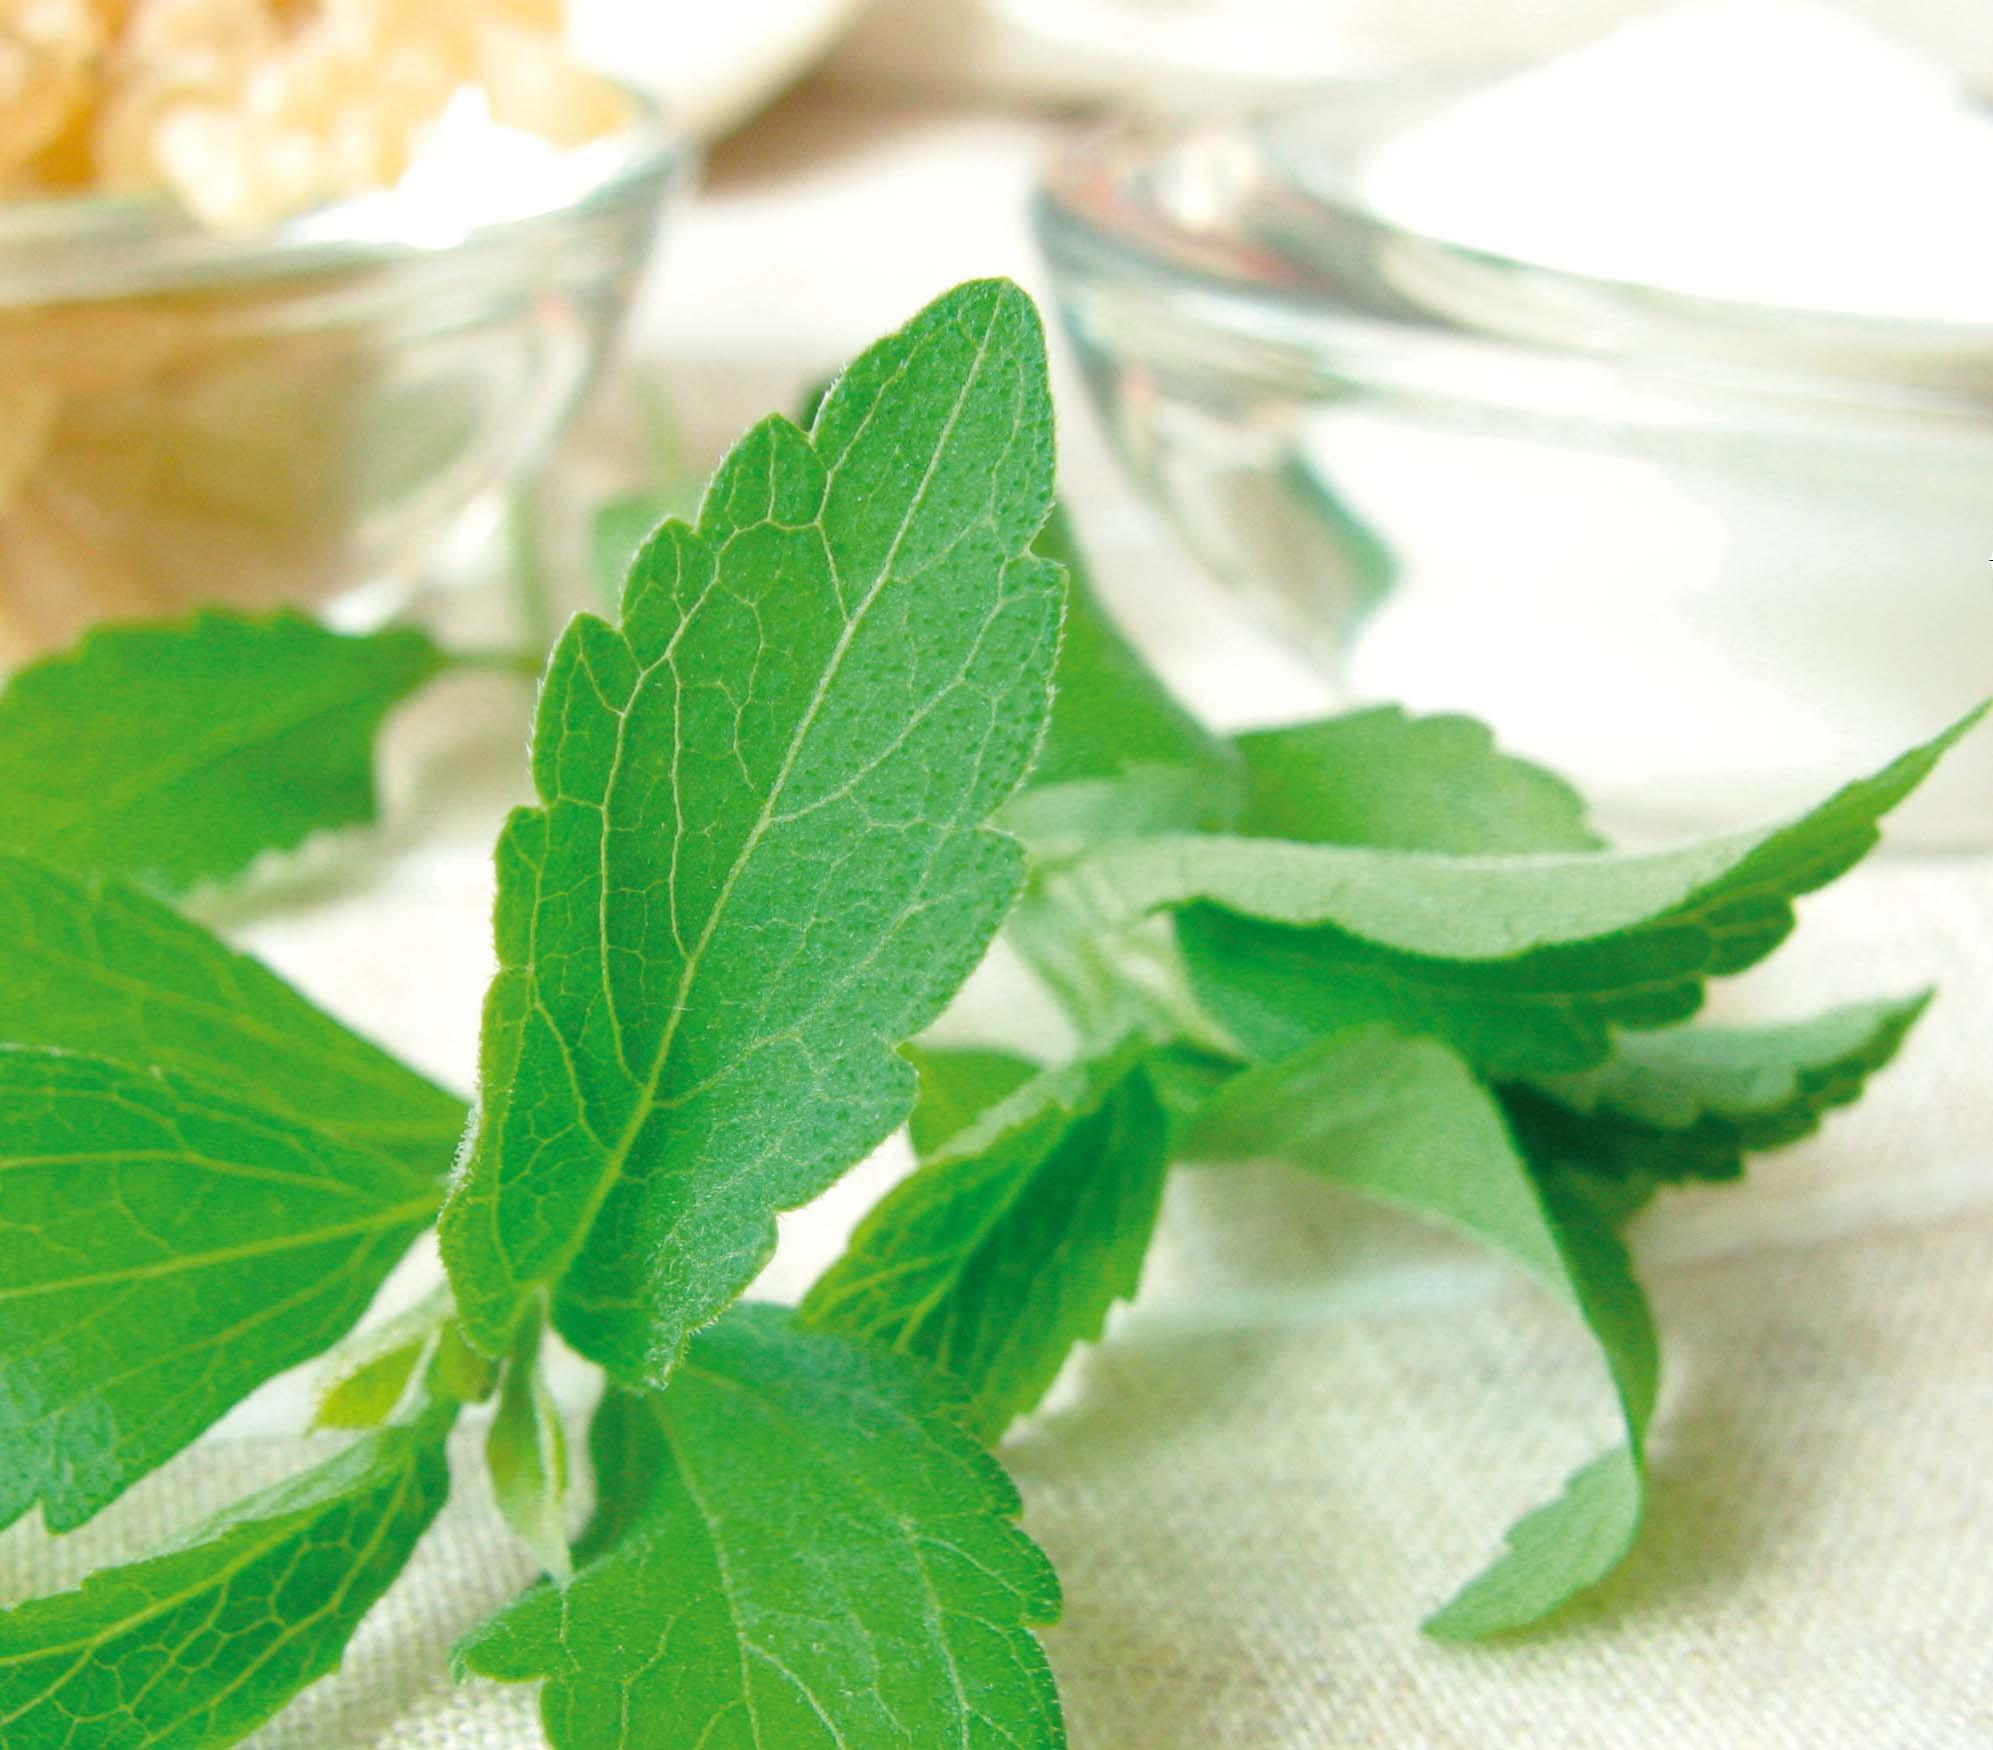 Stevia dolci foglie senza calorie cucina naturale for Stevia pianta